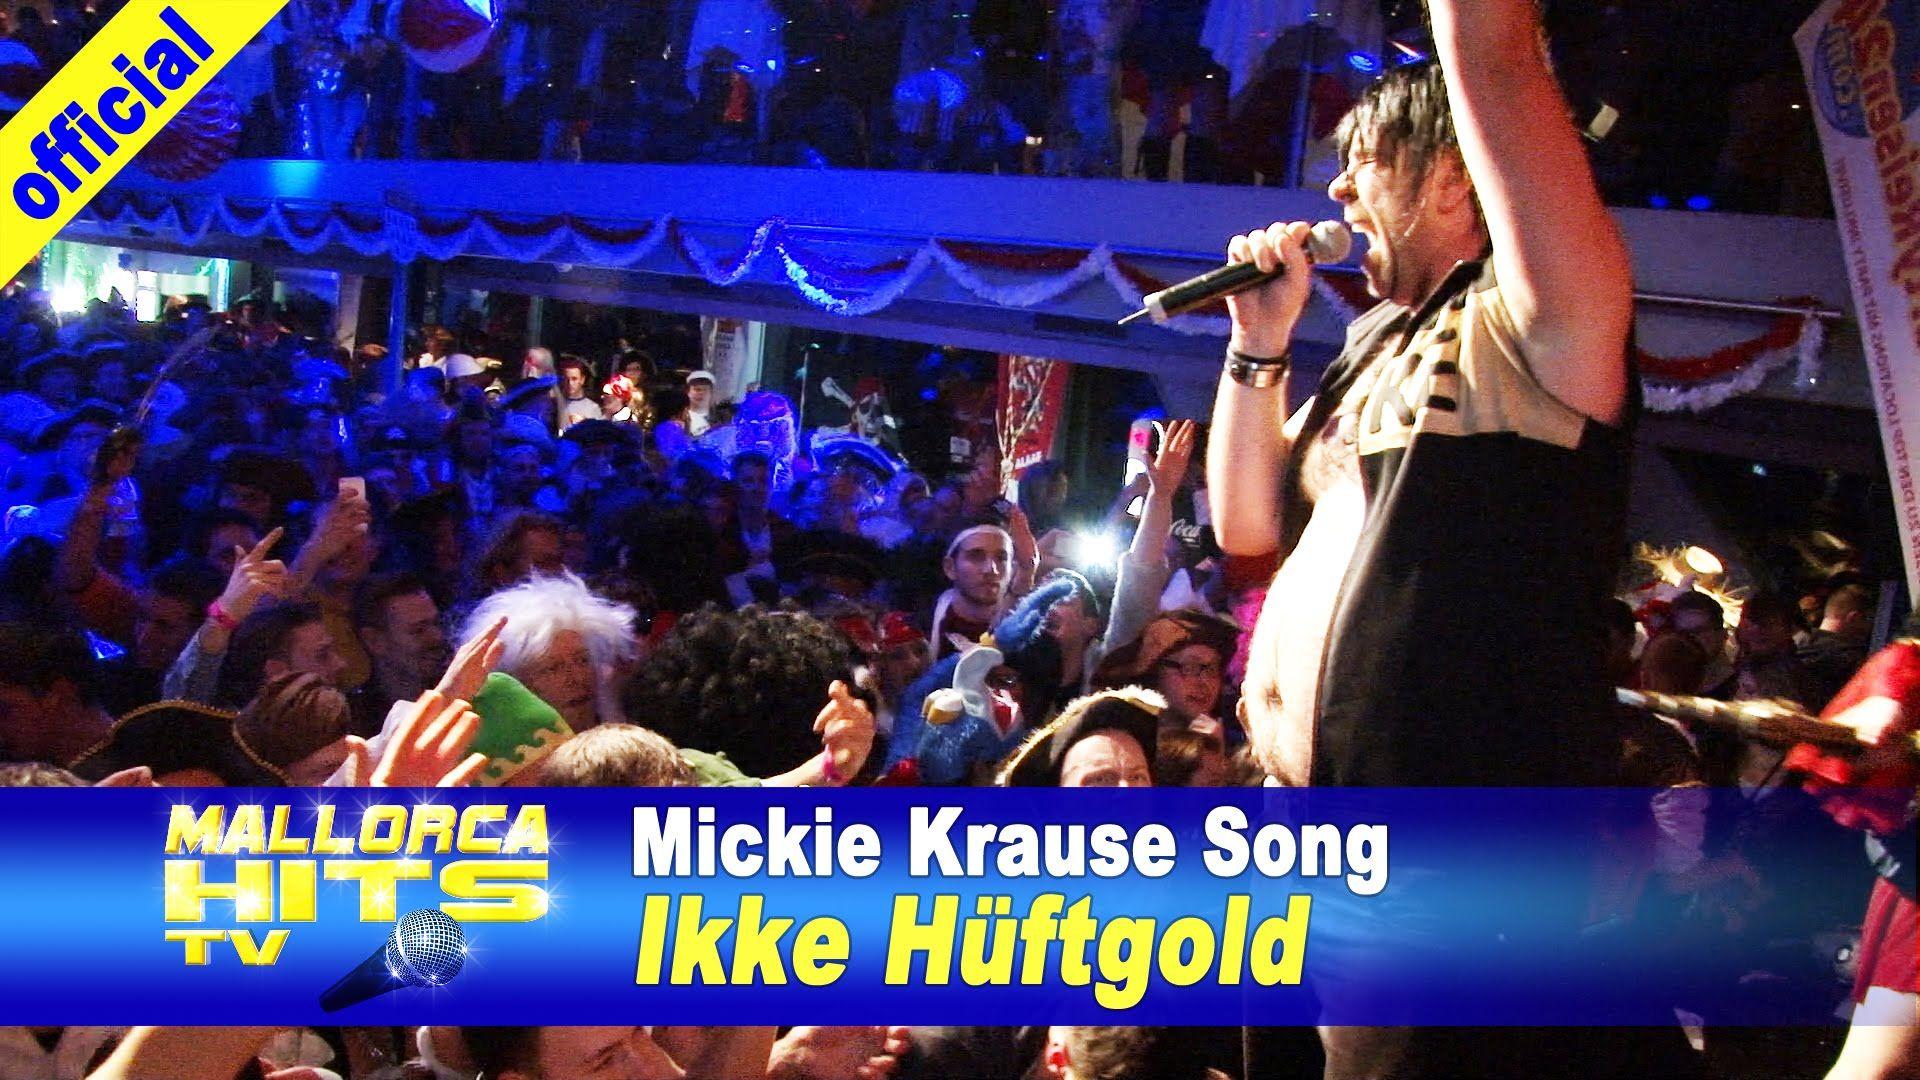 Ikke Hüftgold - Mickie Krause Song - Ballermann Hits ...